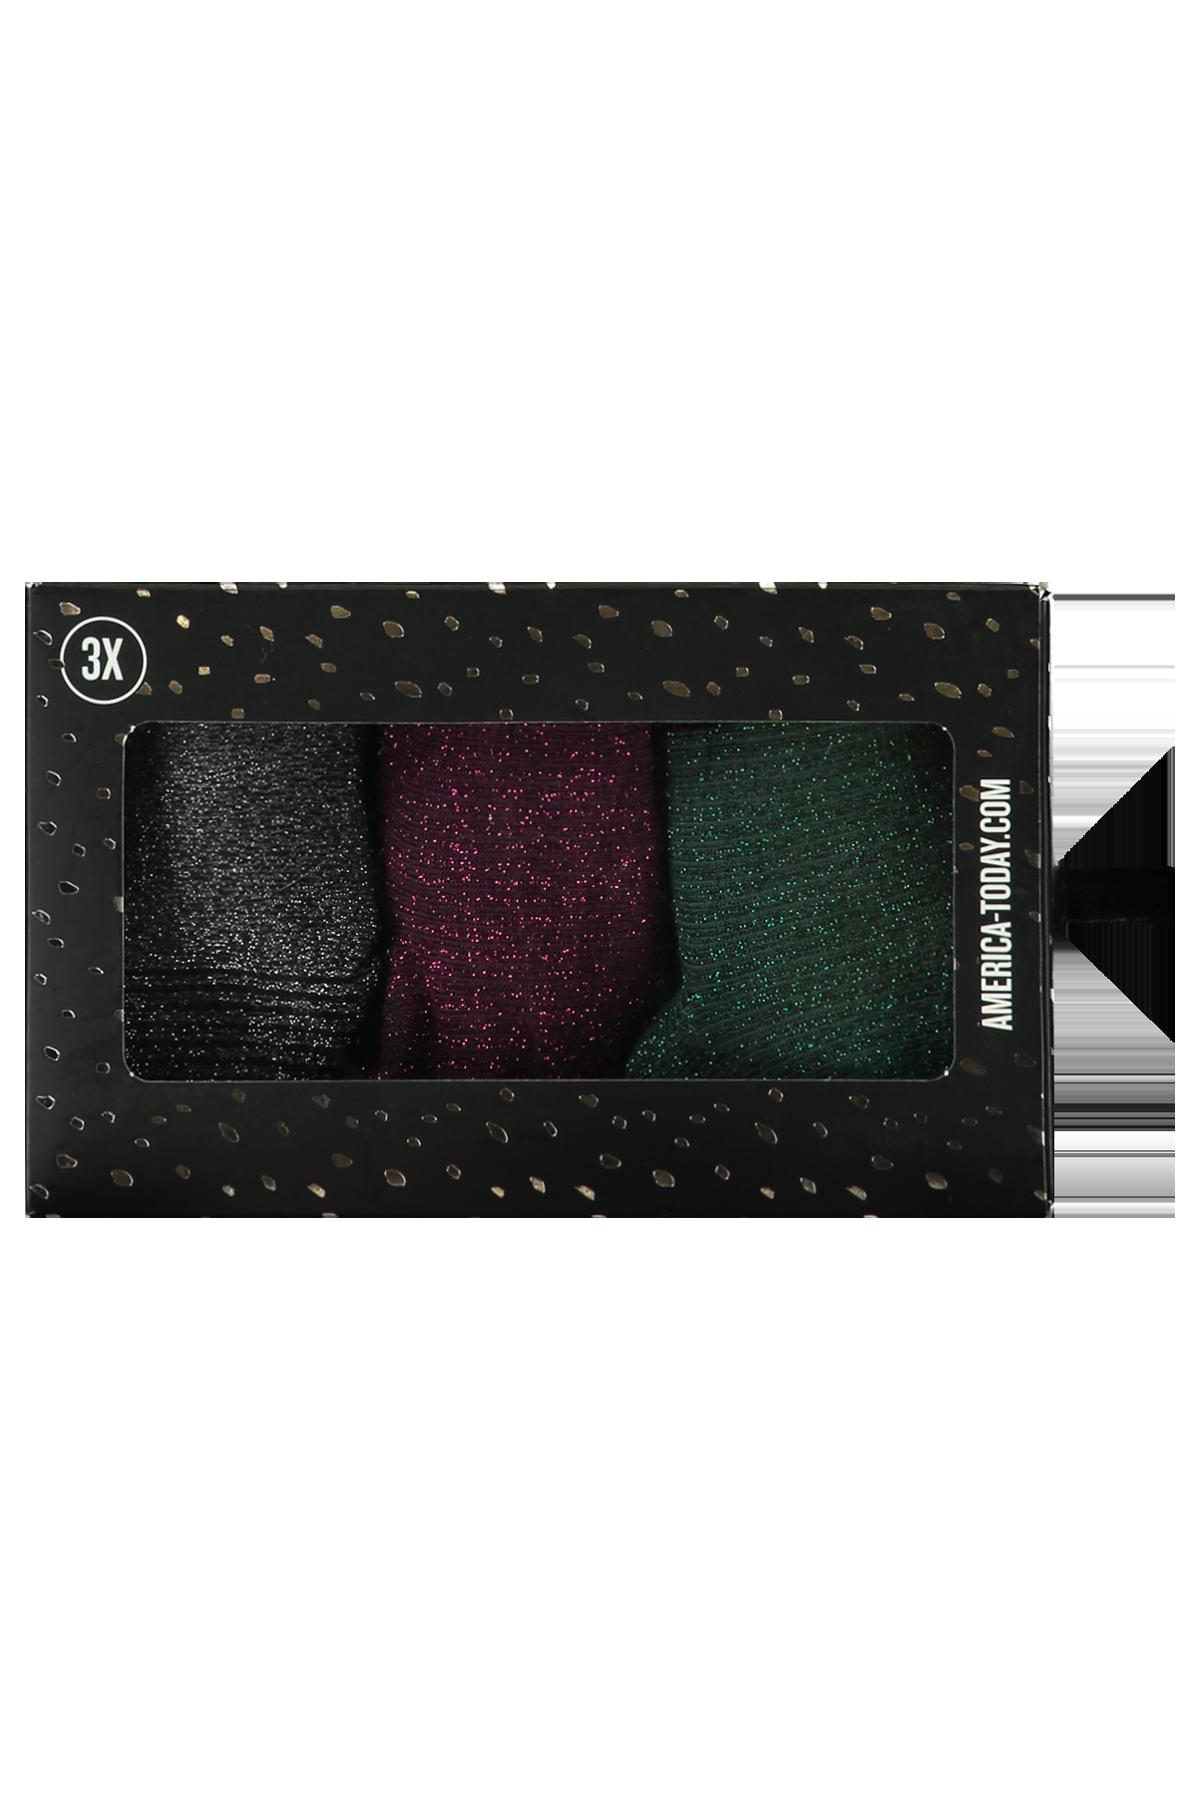 Gift 3pack XMAS box